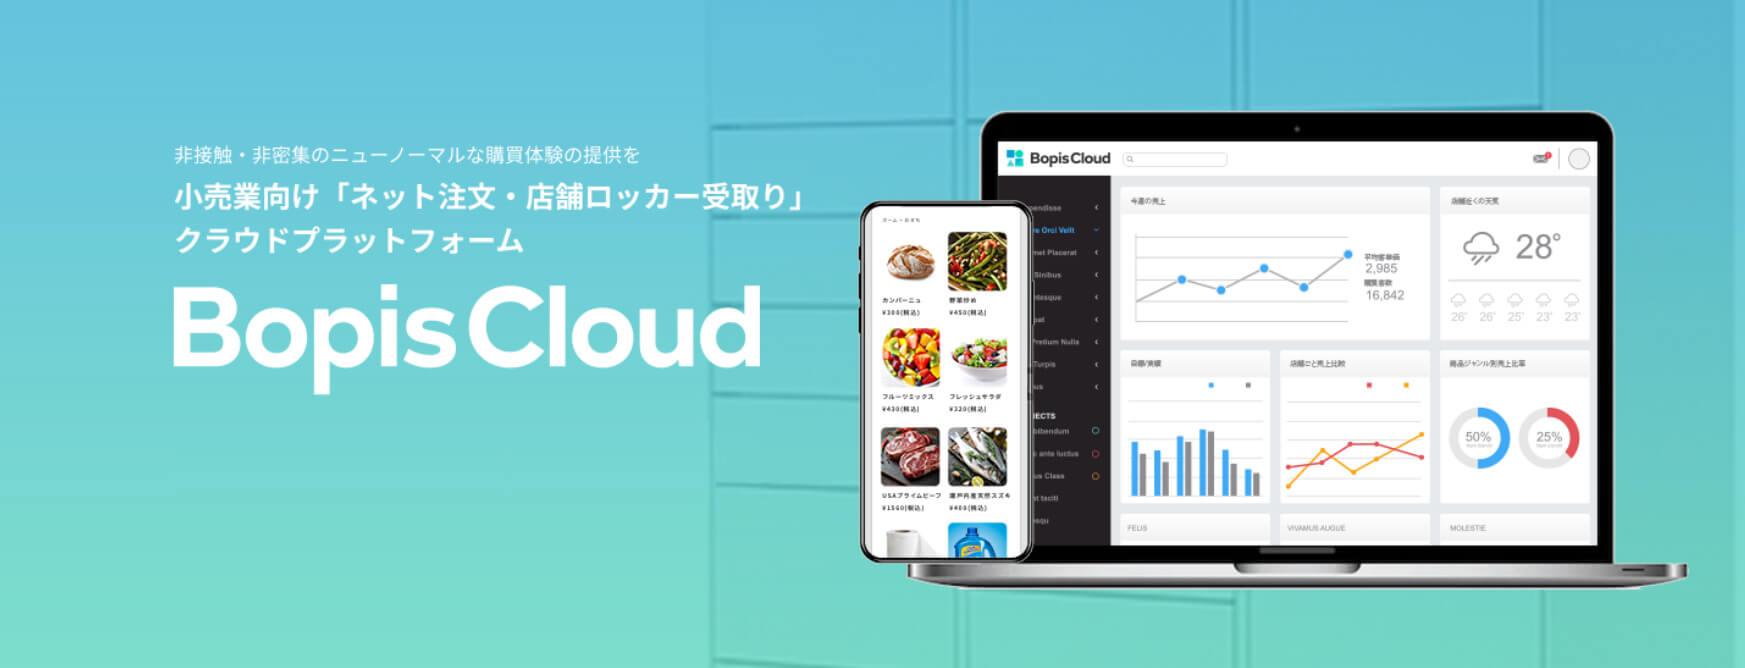 BOPIS Cloudの概要